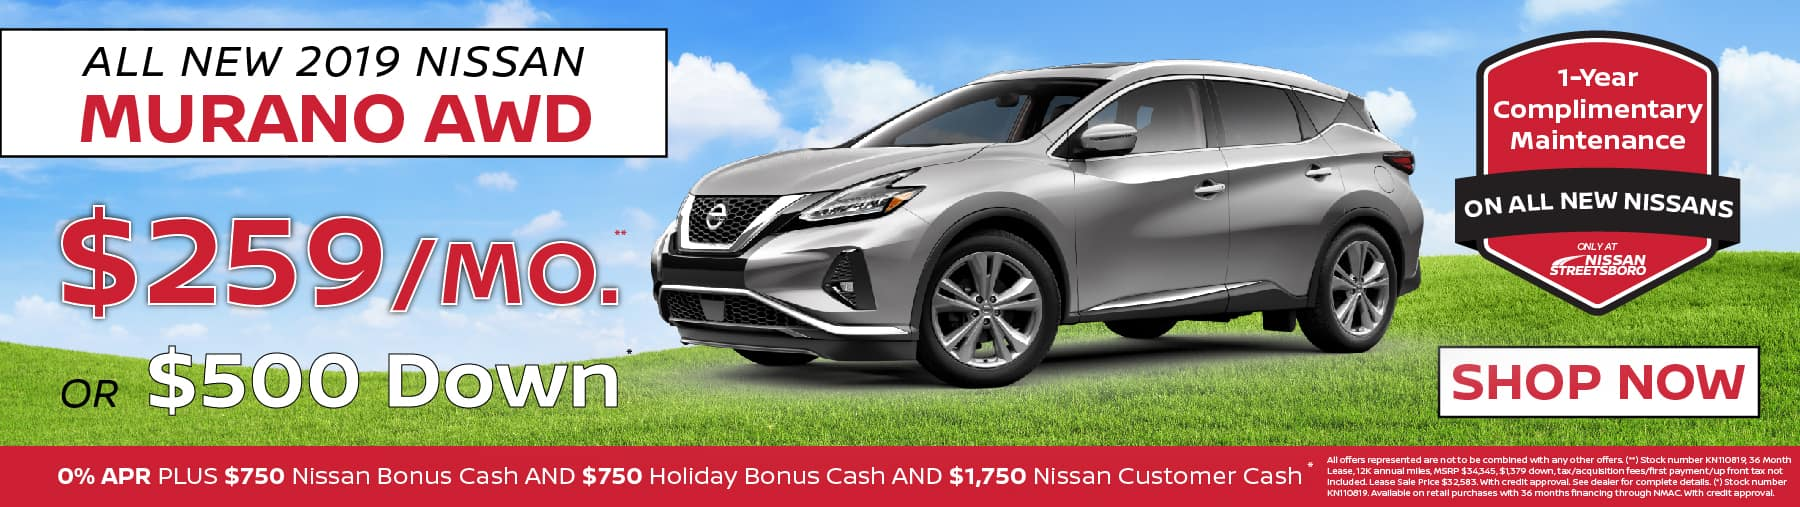 Nissan Murano Special Ohio